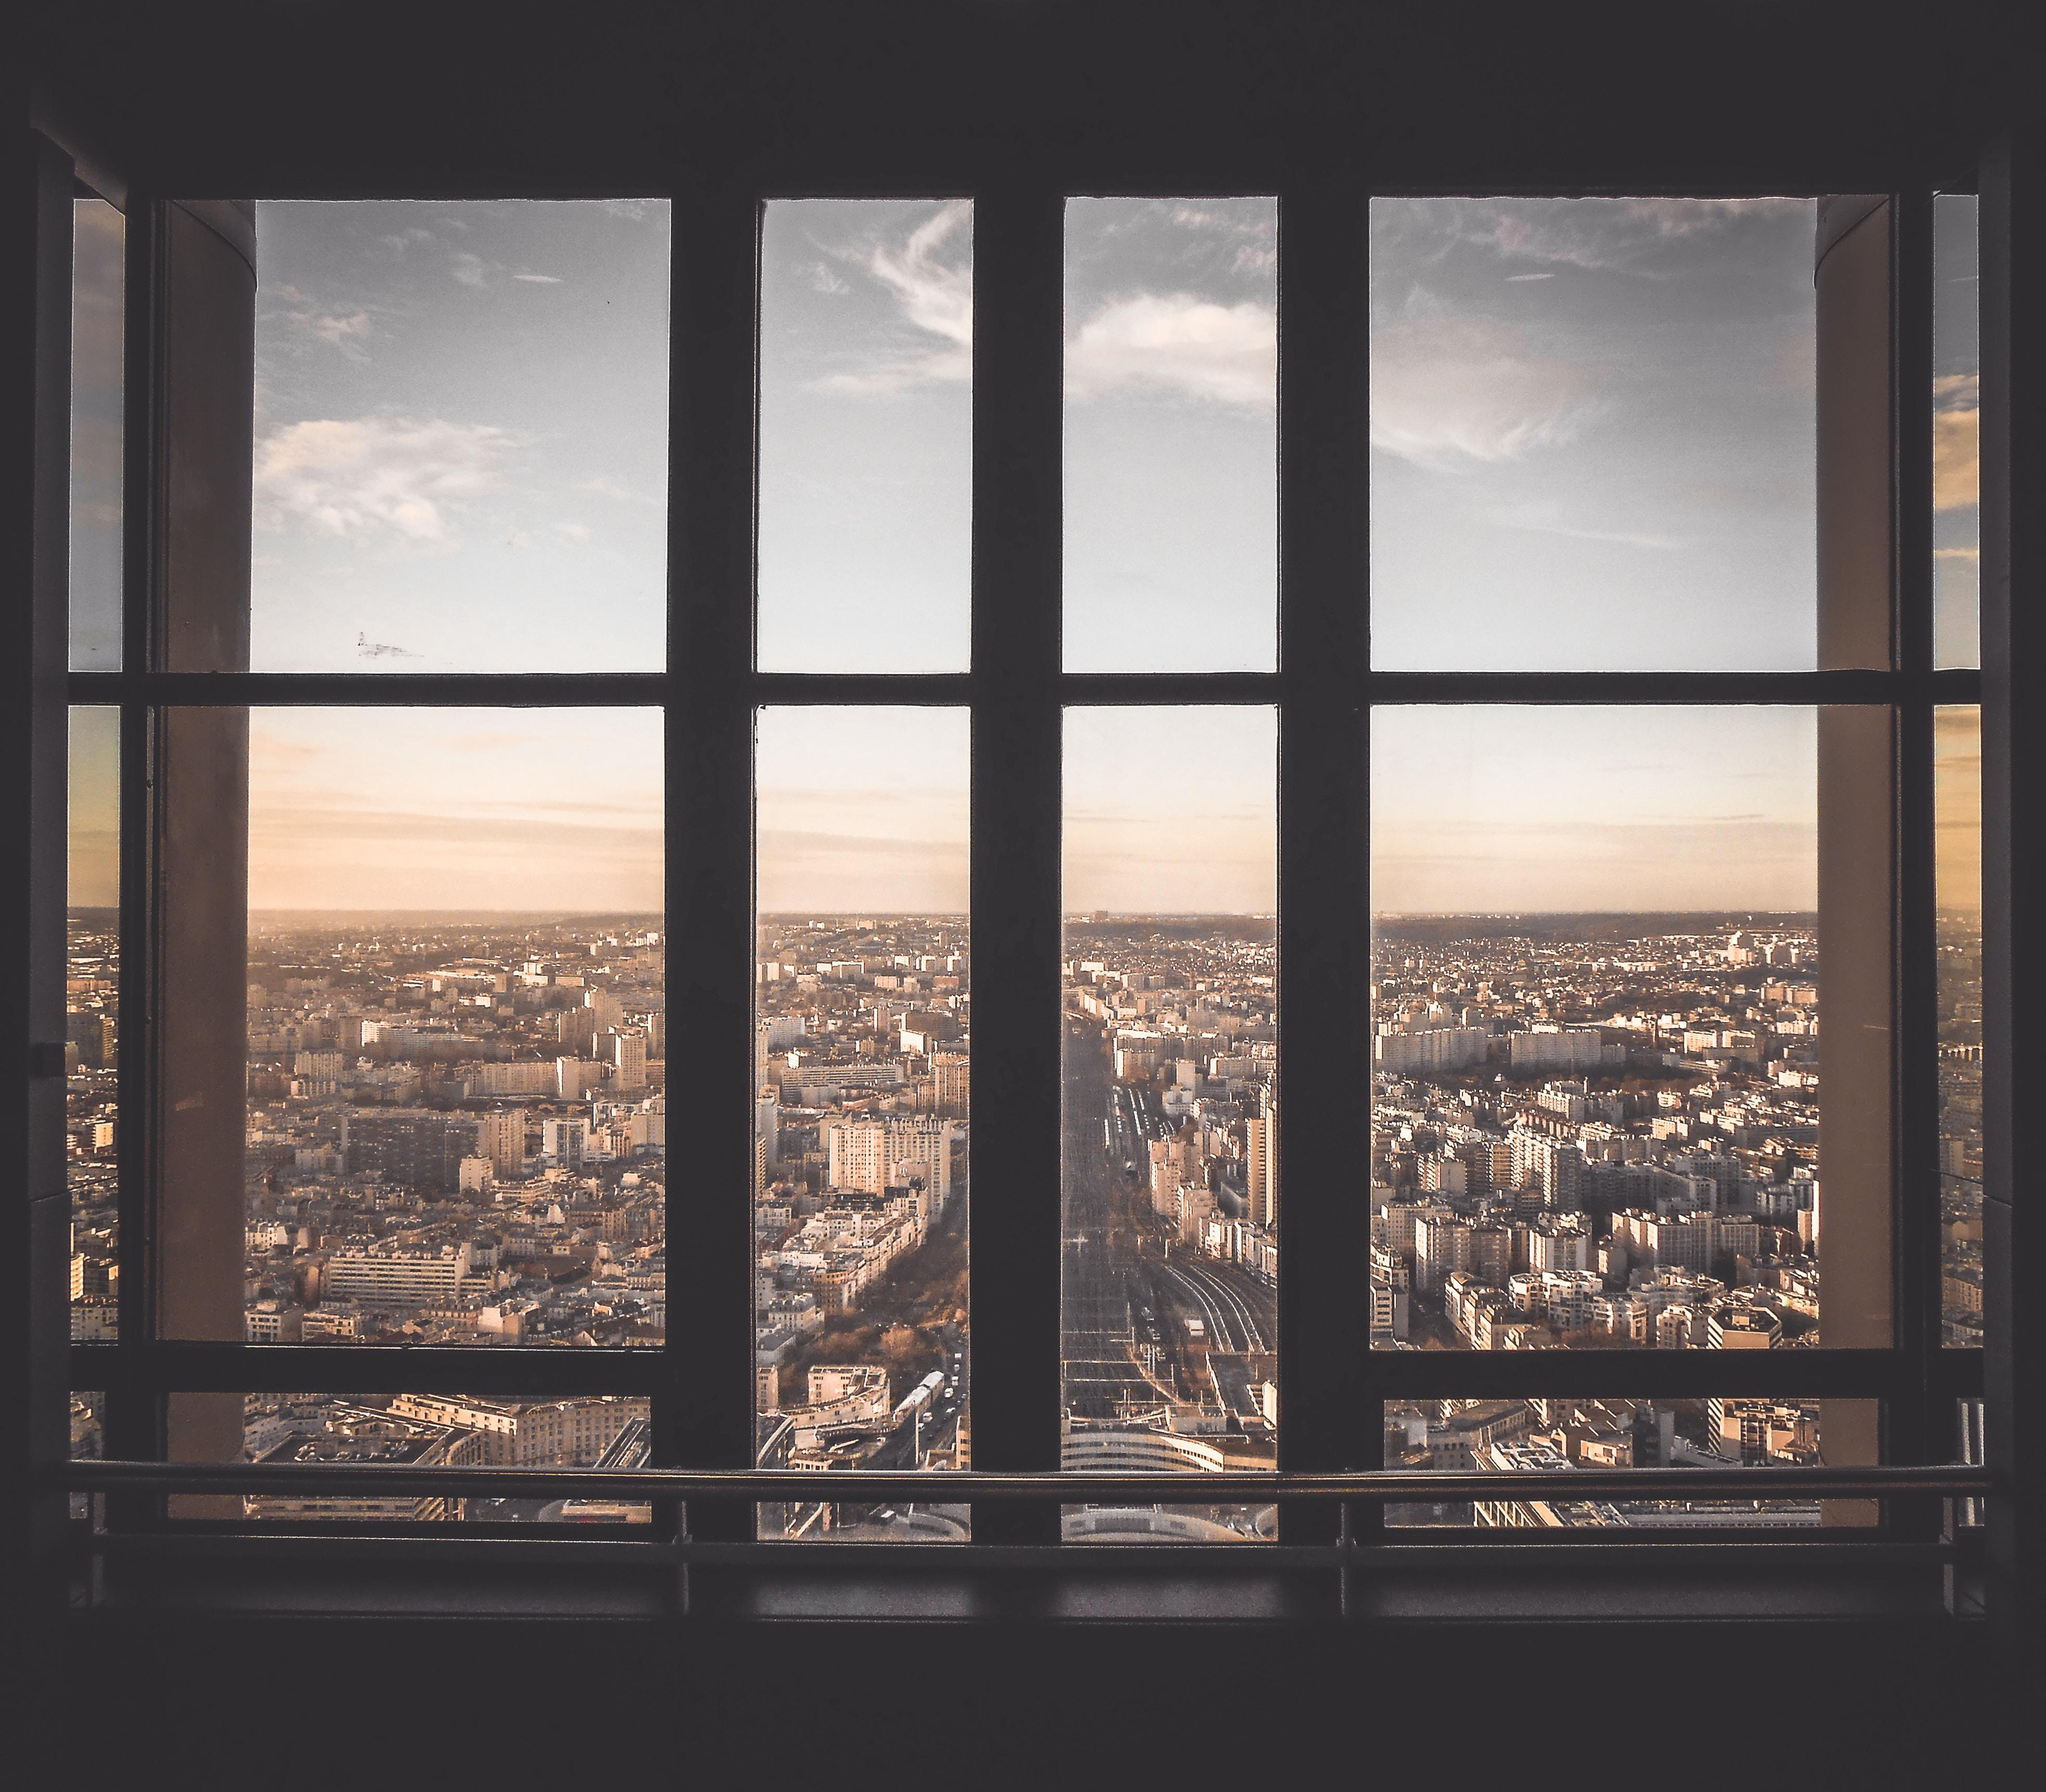 glass panel window showing city buildings under blue sky